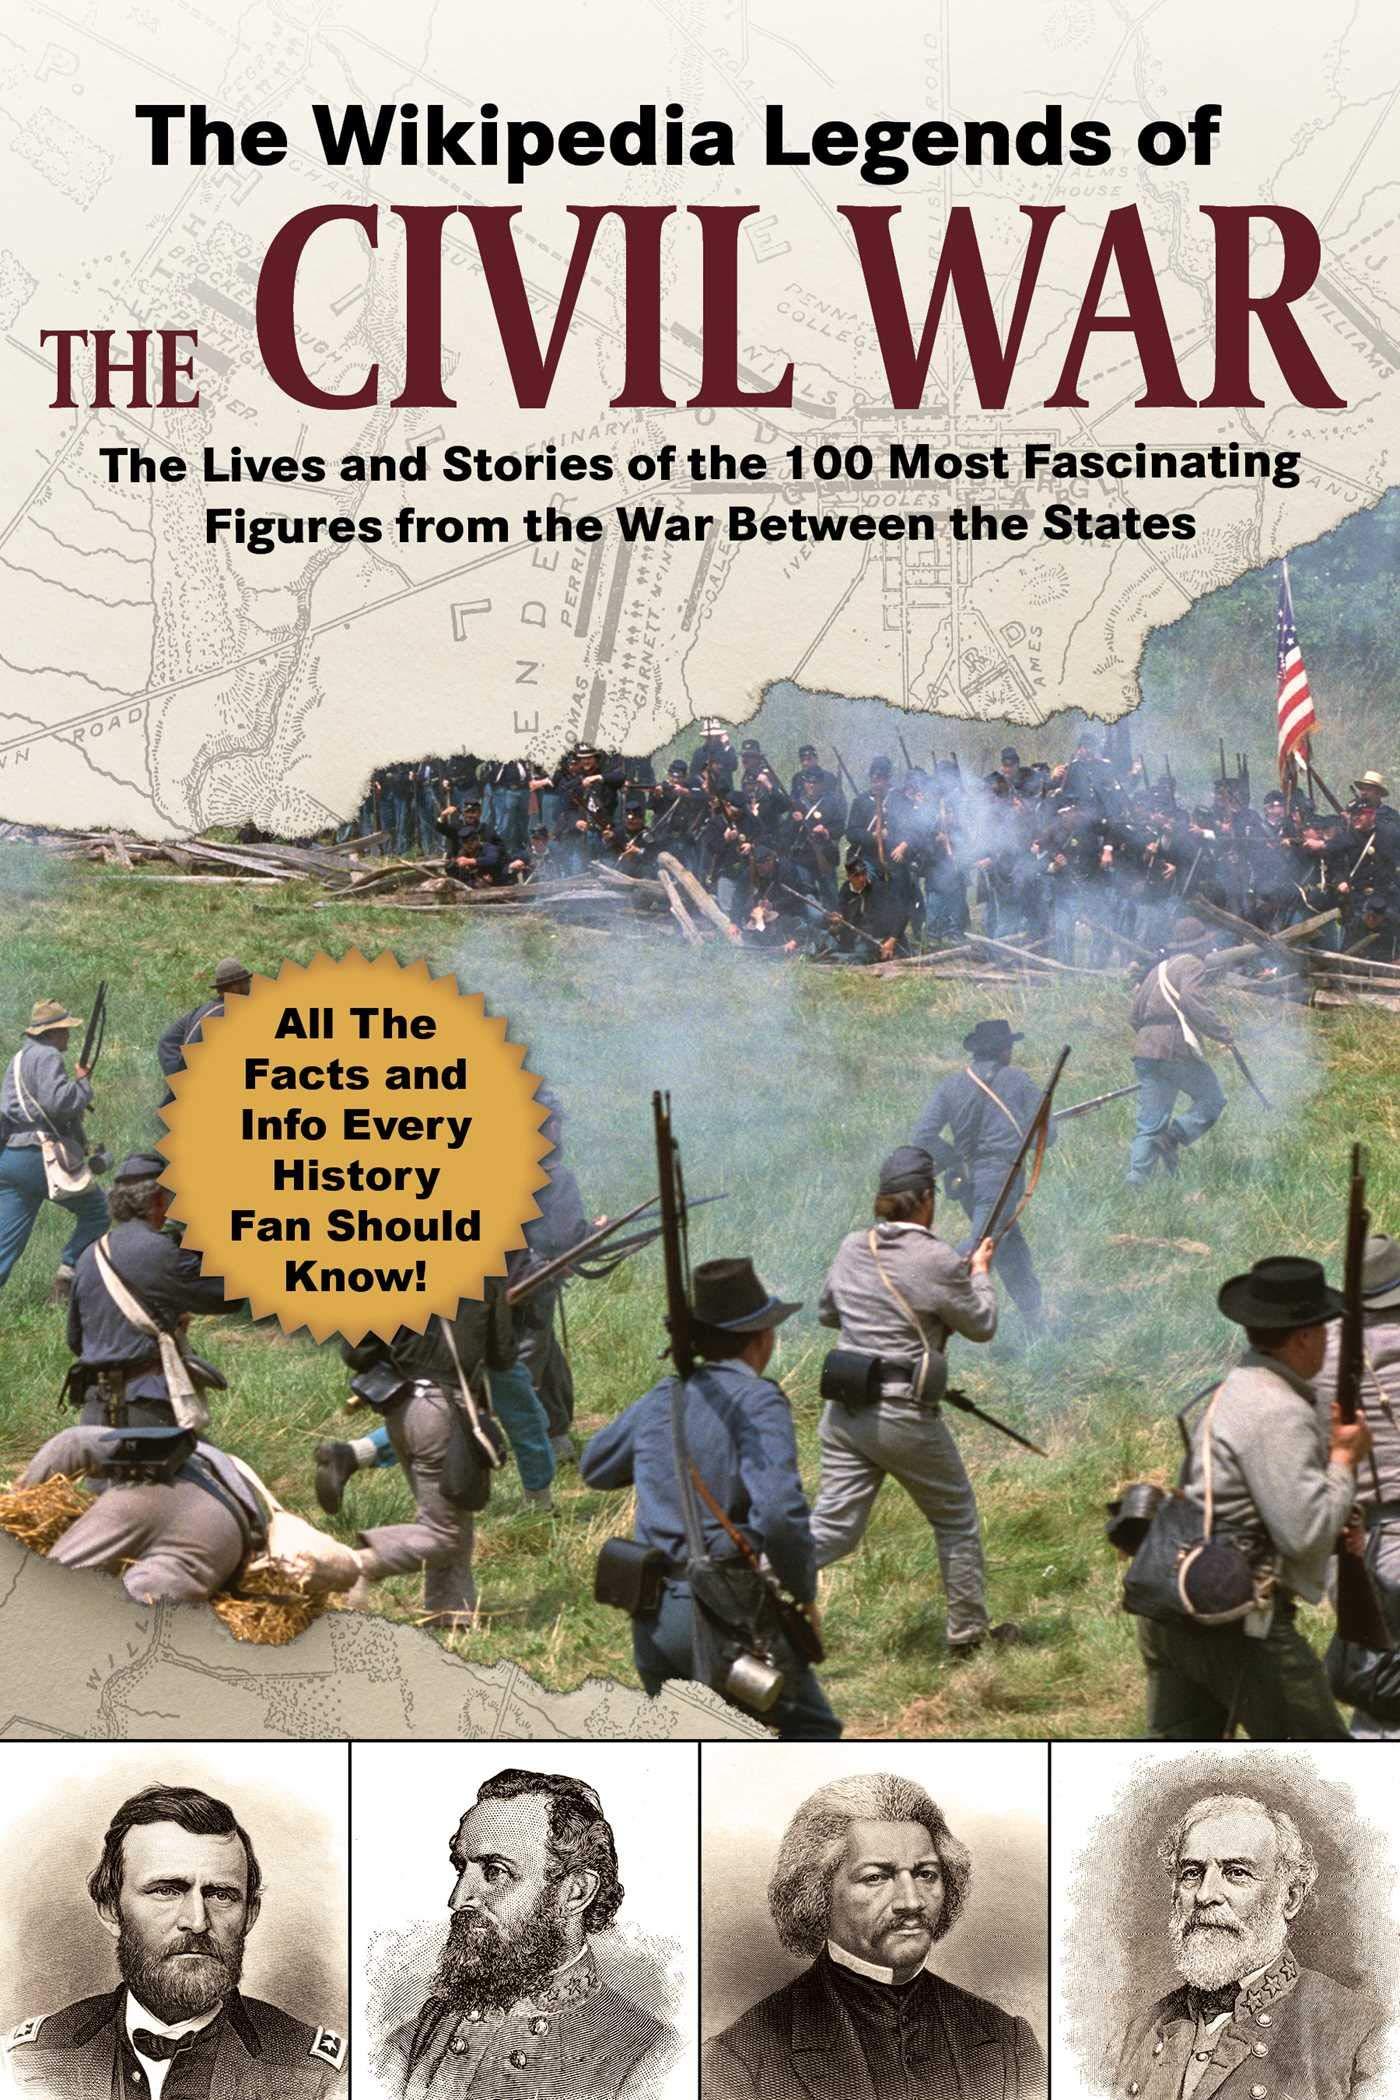 The Wikipedia Legends of the Civil War (Wikipedia Books)